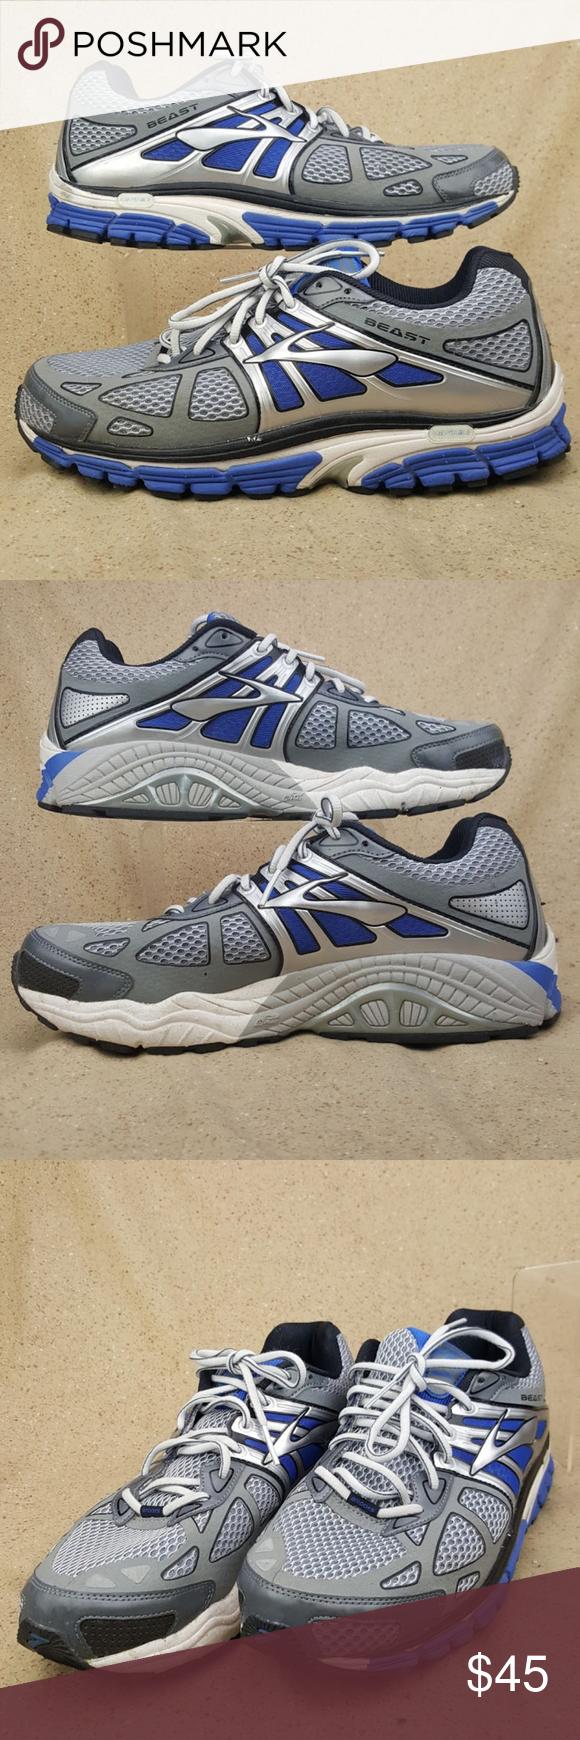 e3a08311b7e58 Brooks Beast 14 Running Shoes Men s Size 12 2E Brooks Beast 14 Running Shoes  Blue Silver